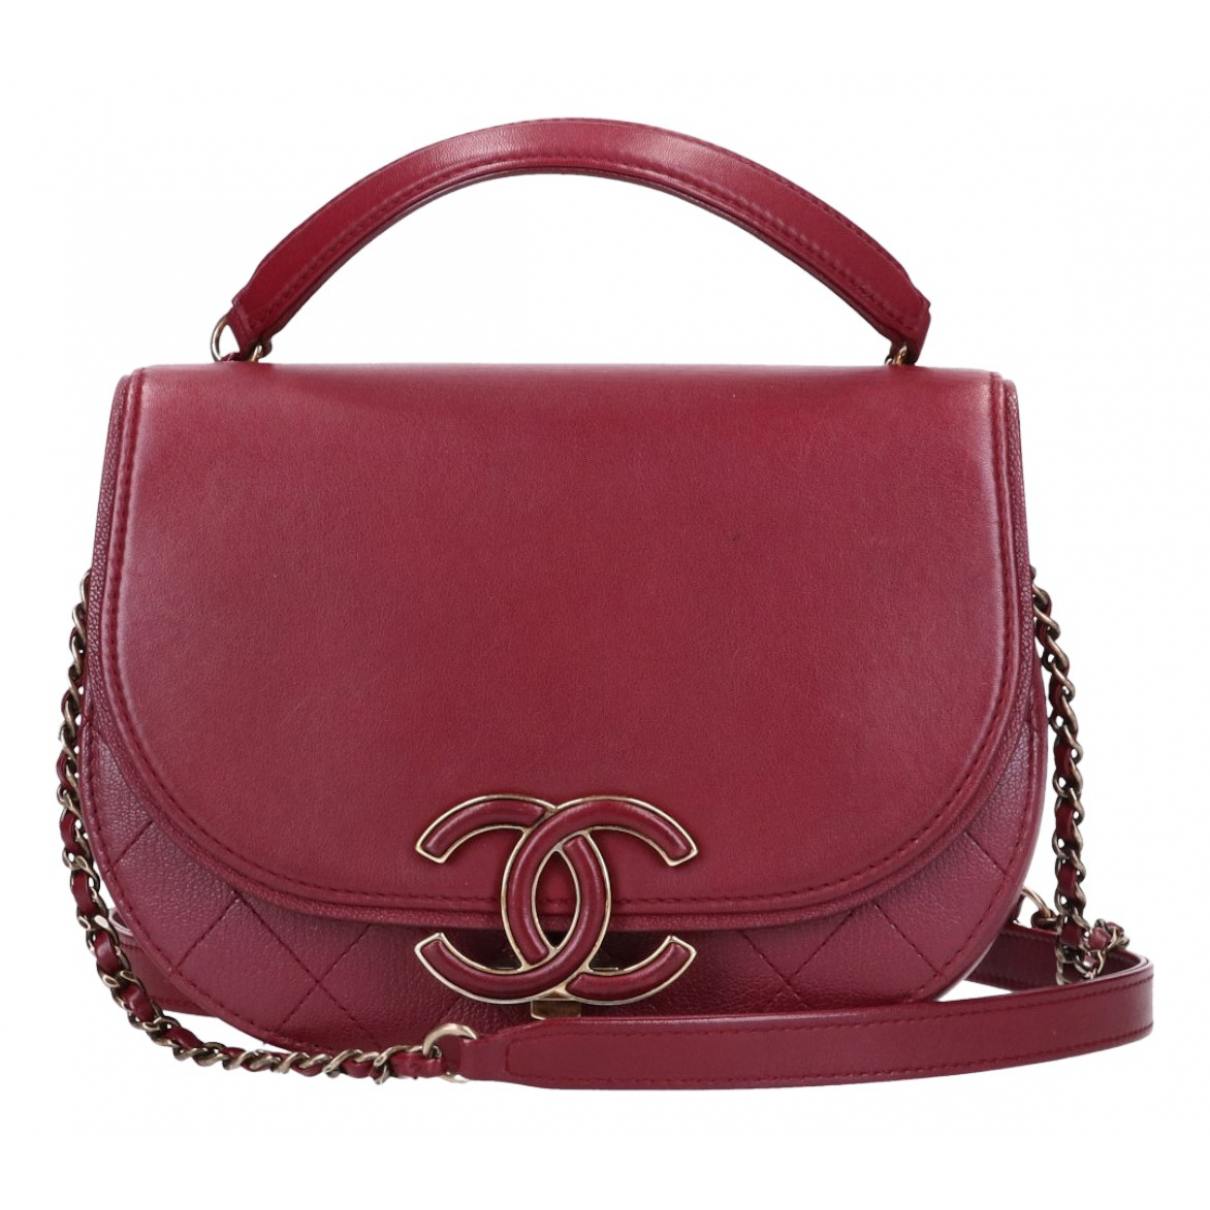 Chanel Coco Curve Handtasche in  Bordeauxrot Leder